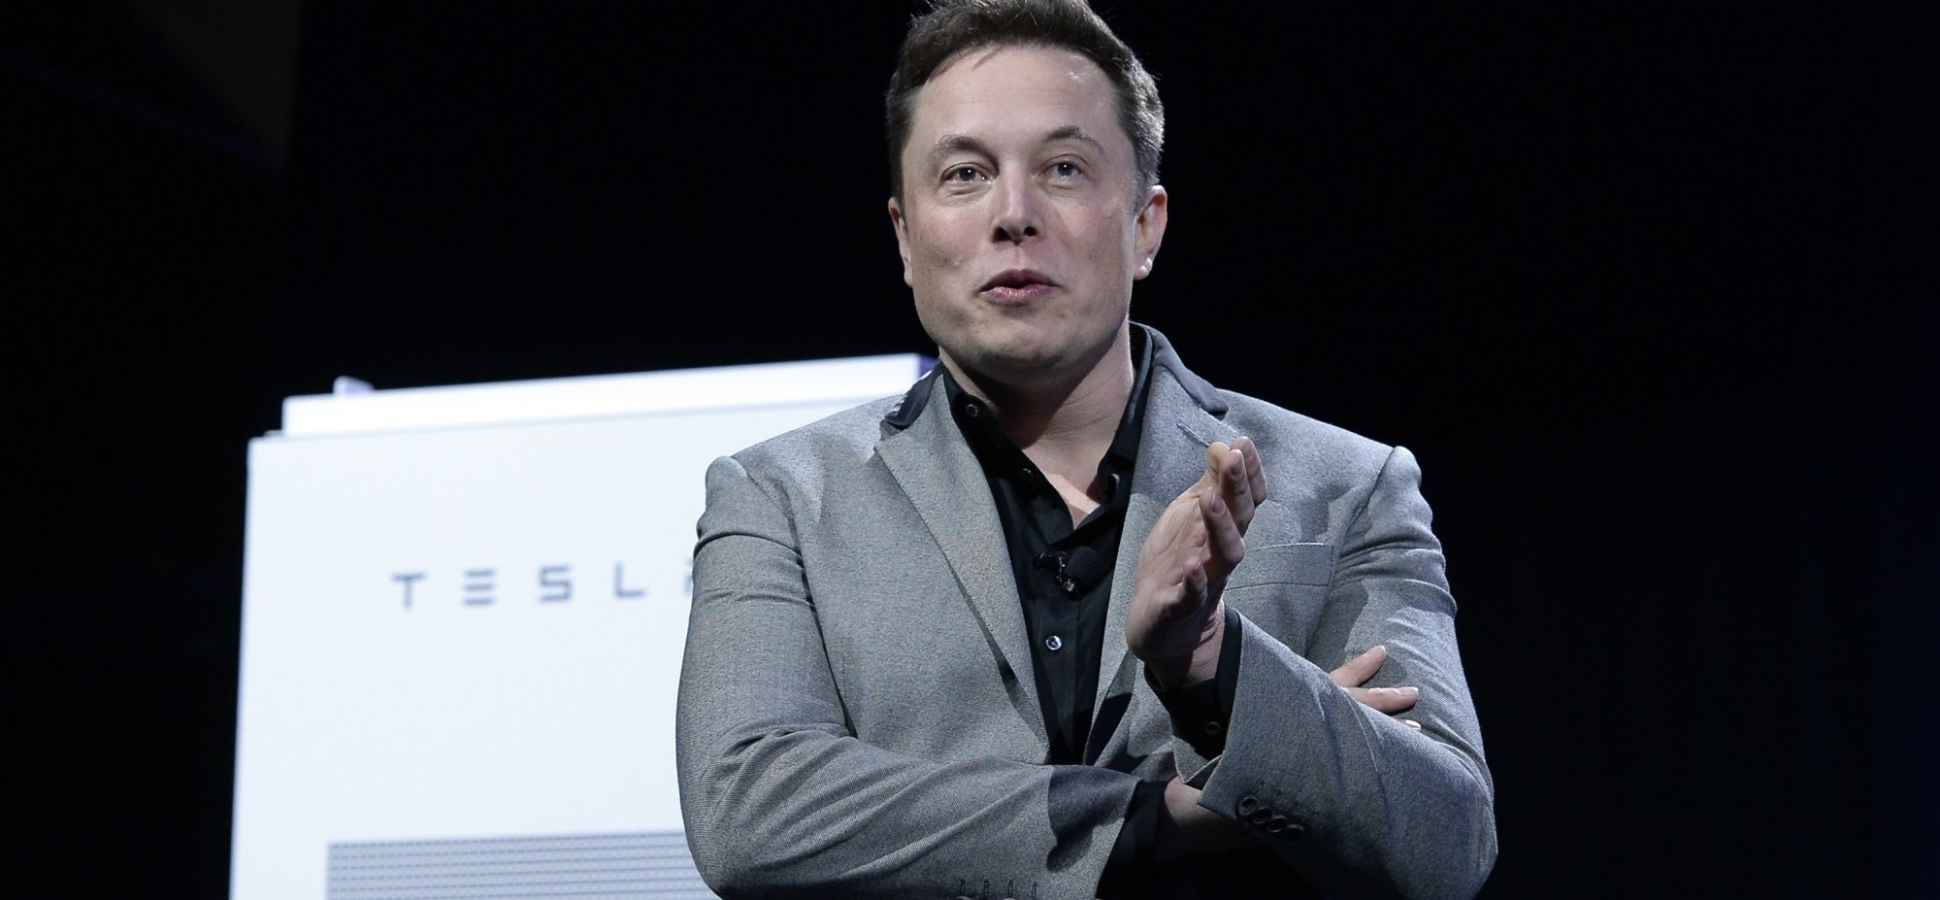 14 Books That Influenced Elon Musk